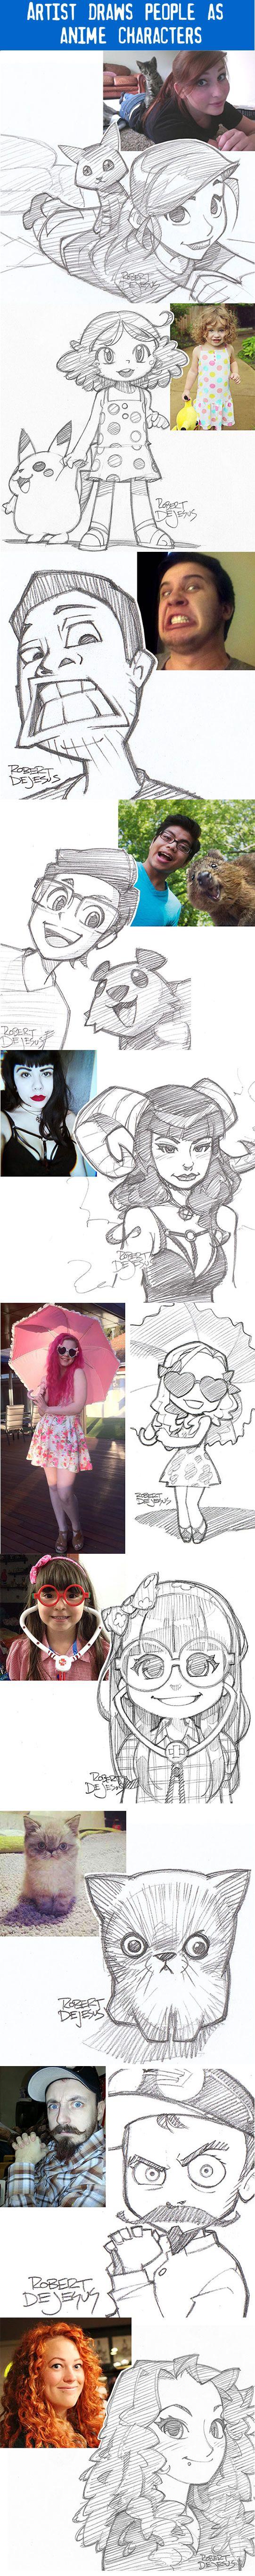 'Artist Robert Dejesus draws strangers as anime/manga characters....' Awesome!